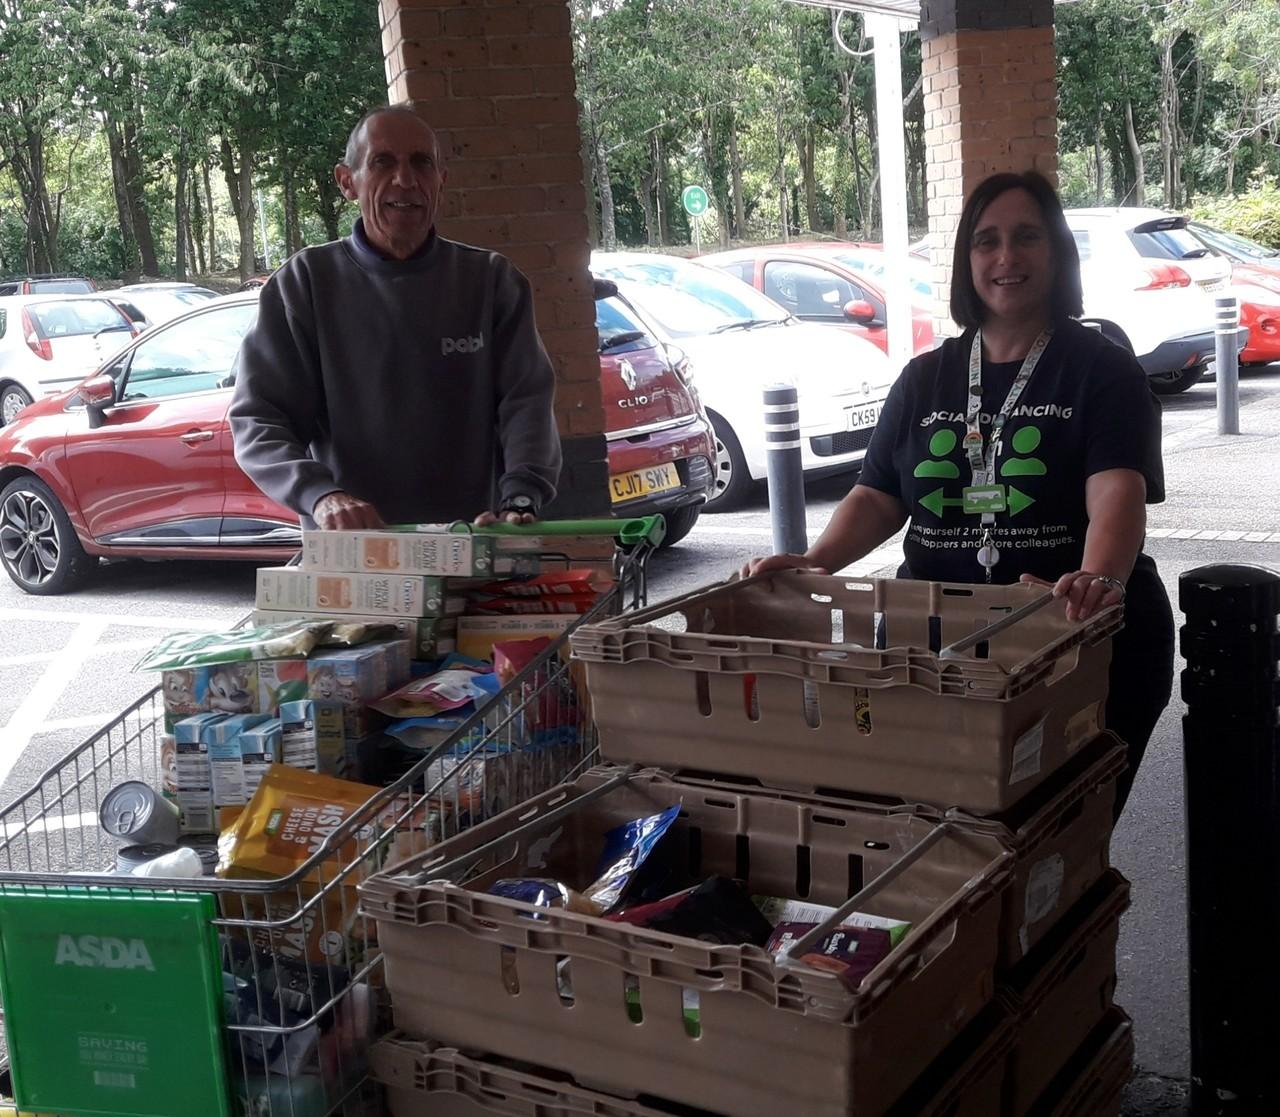 Donation to Newport Foodbank | Asda Newport